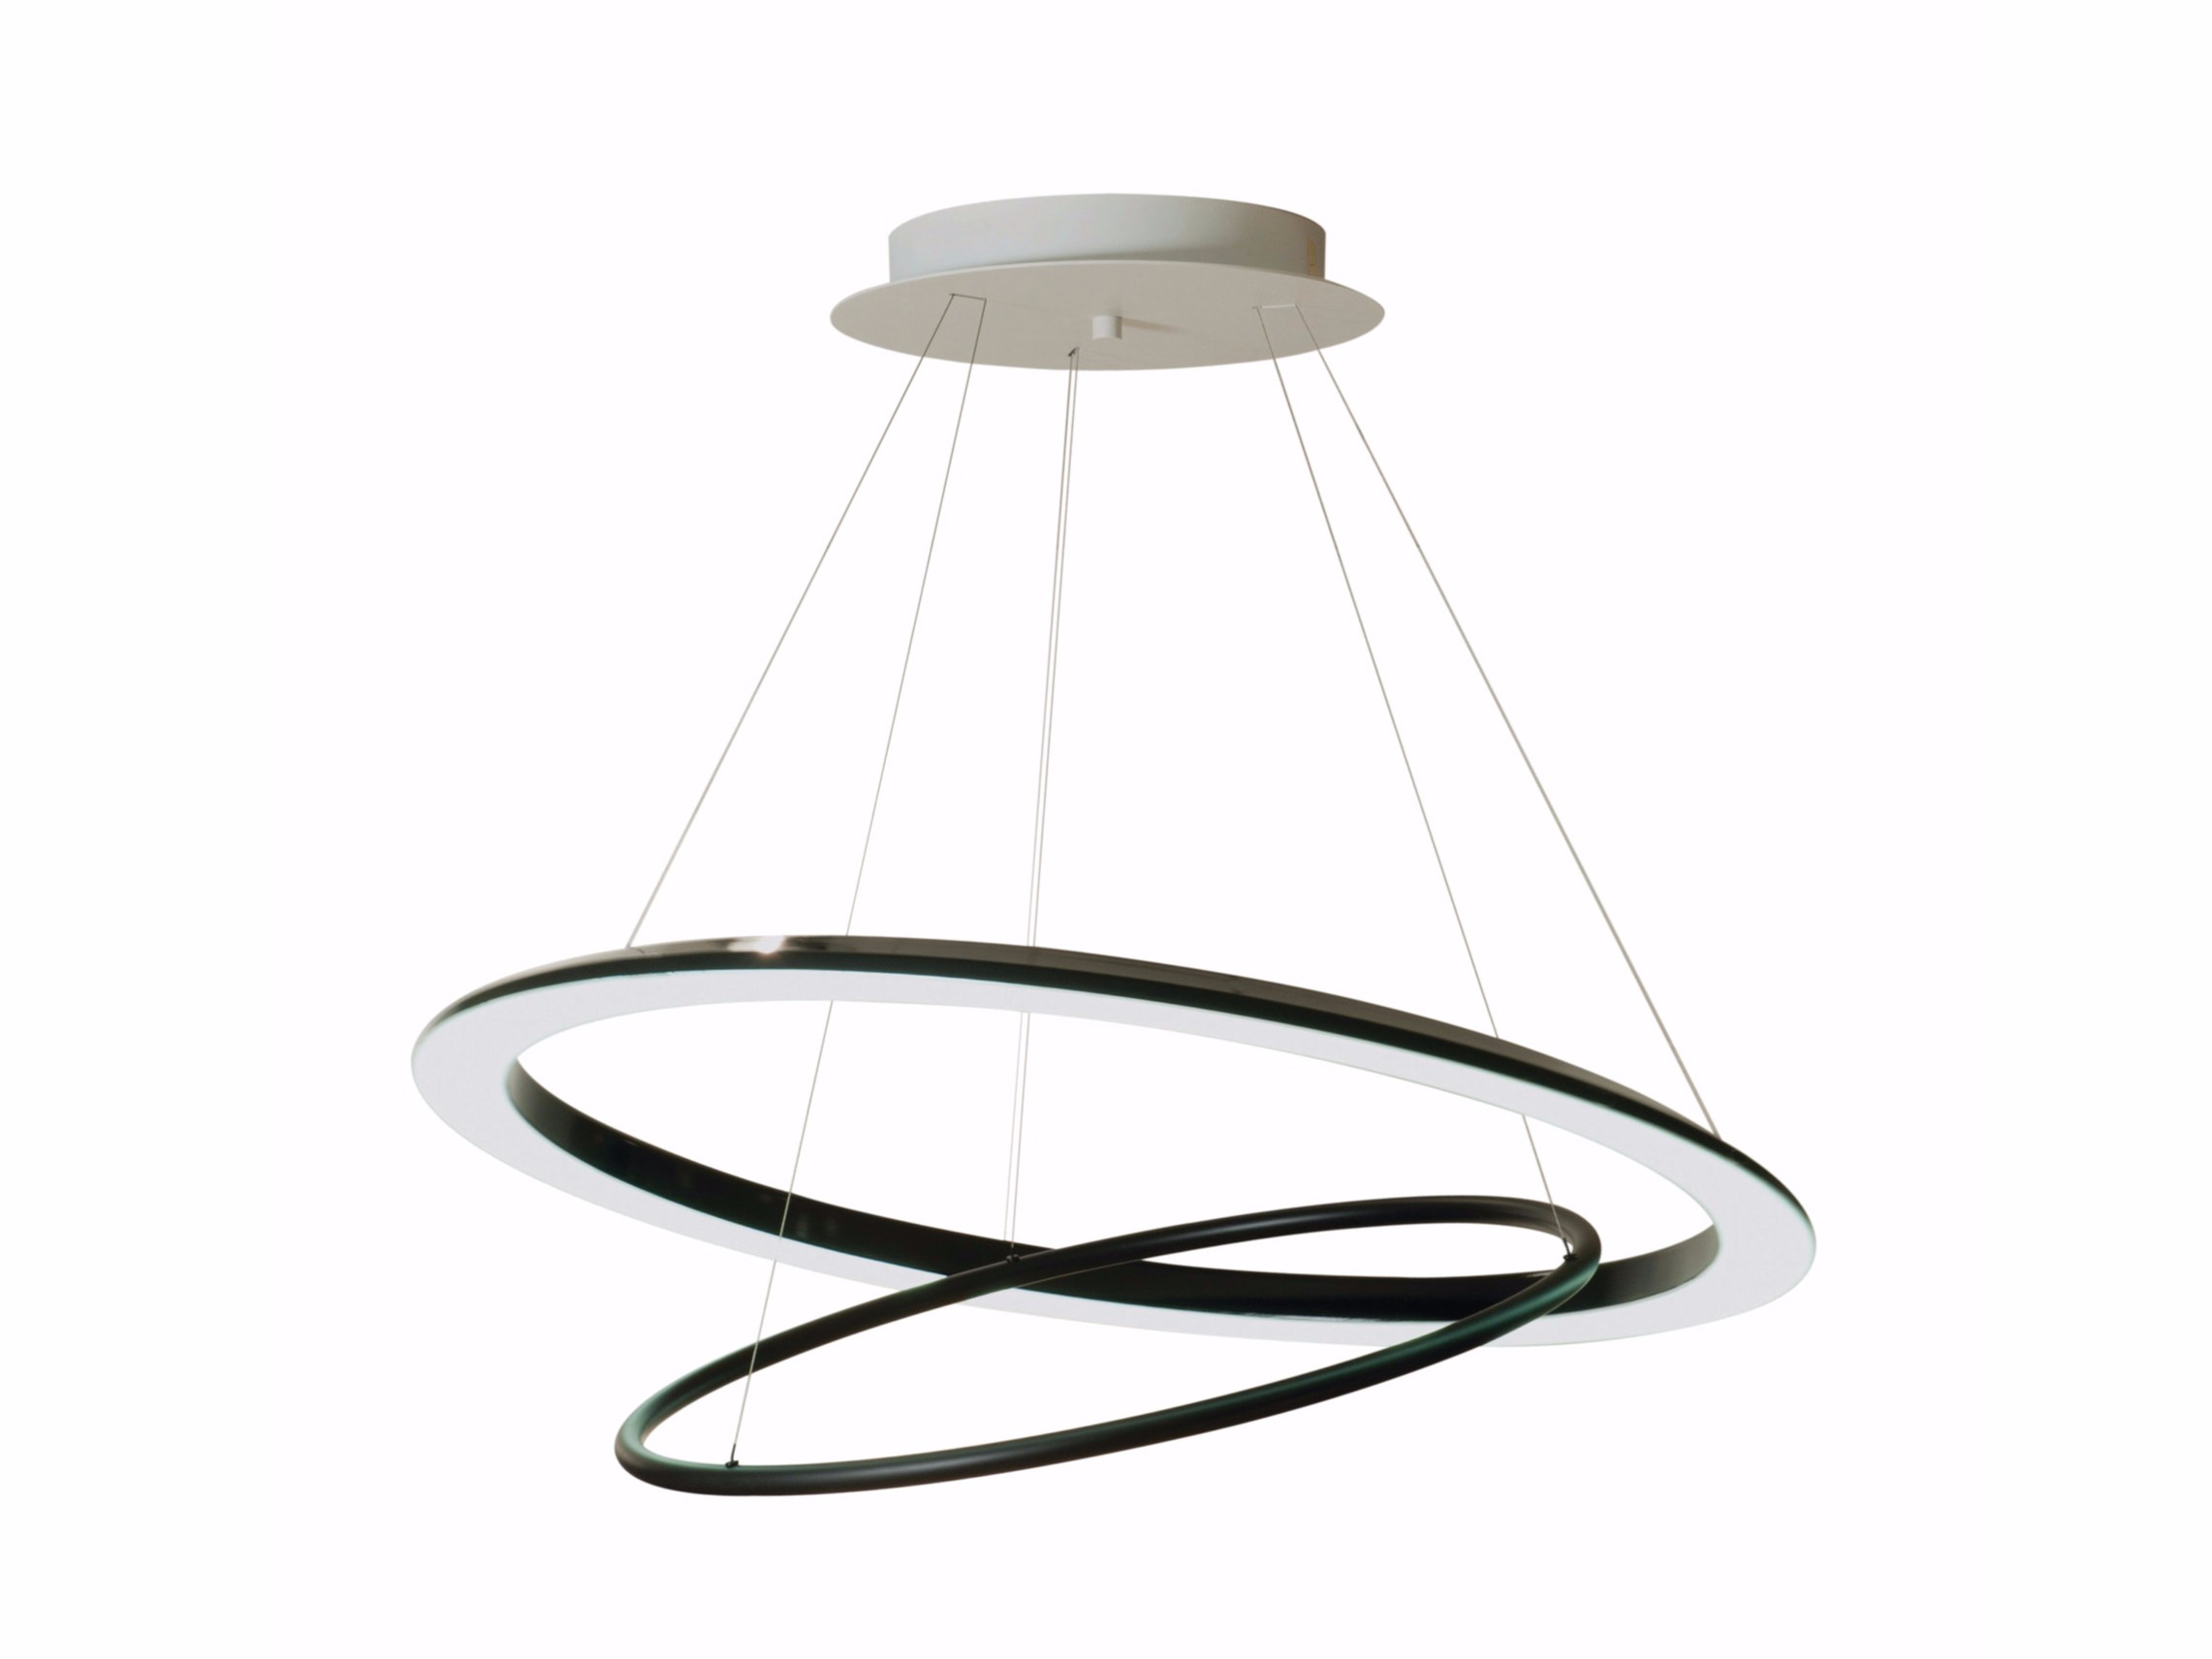 Suspension led orientable o o by roche bobois design julien groboz - Suspension roche bobois ...